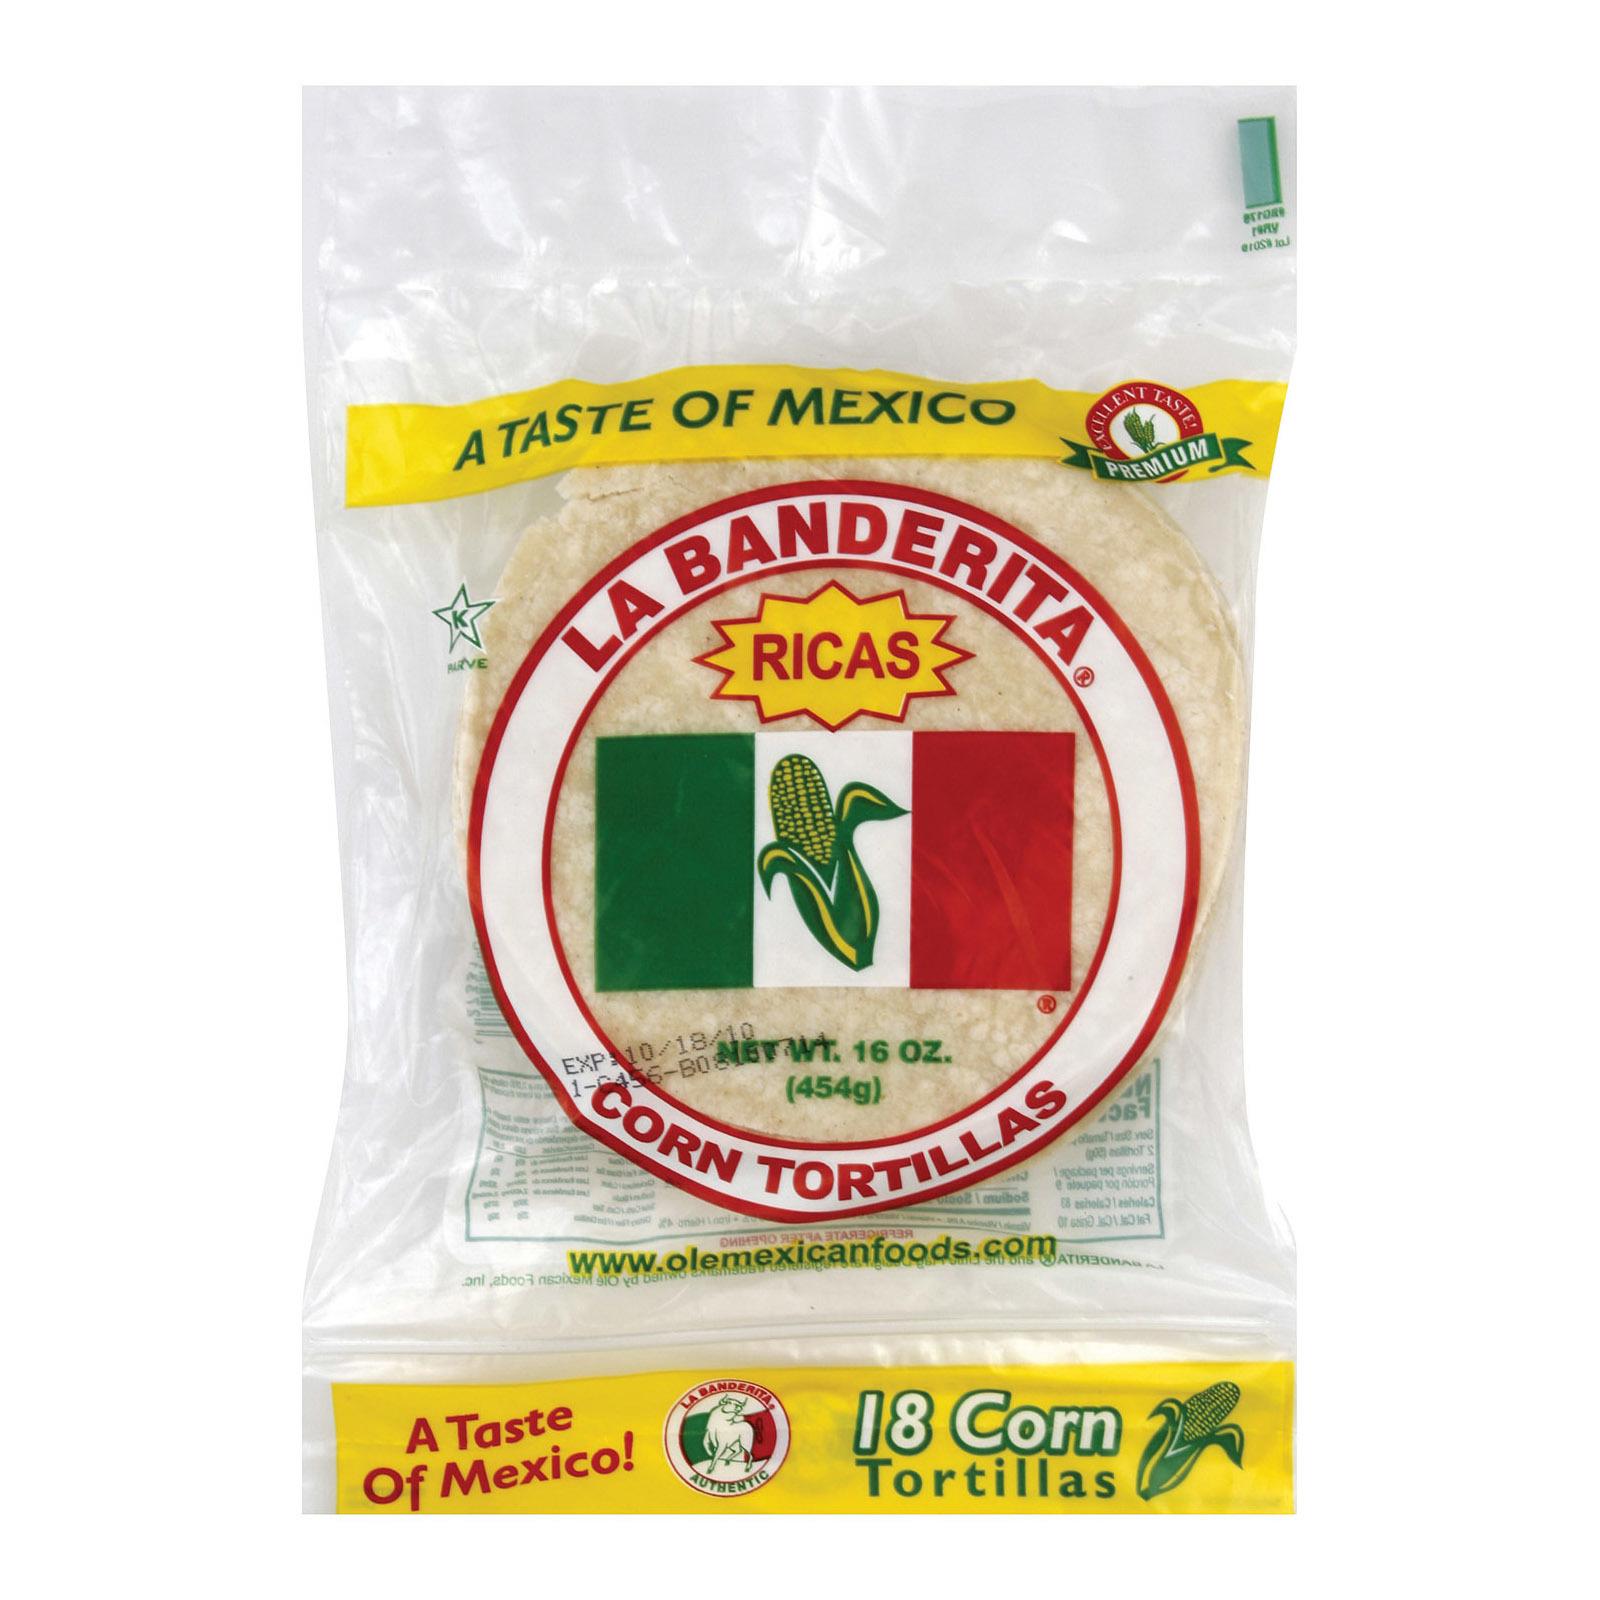 La Banderita Corn Tortillas - White - Case of 12 - 16 oz.